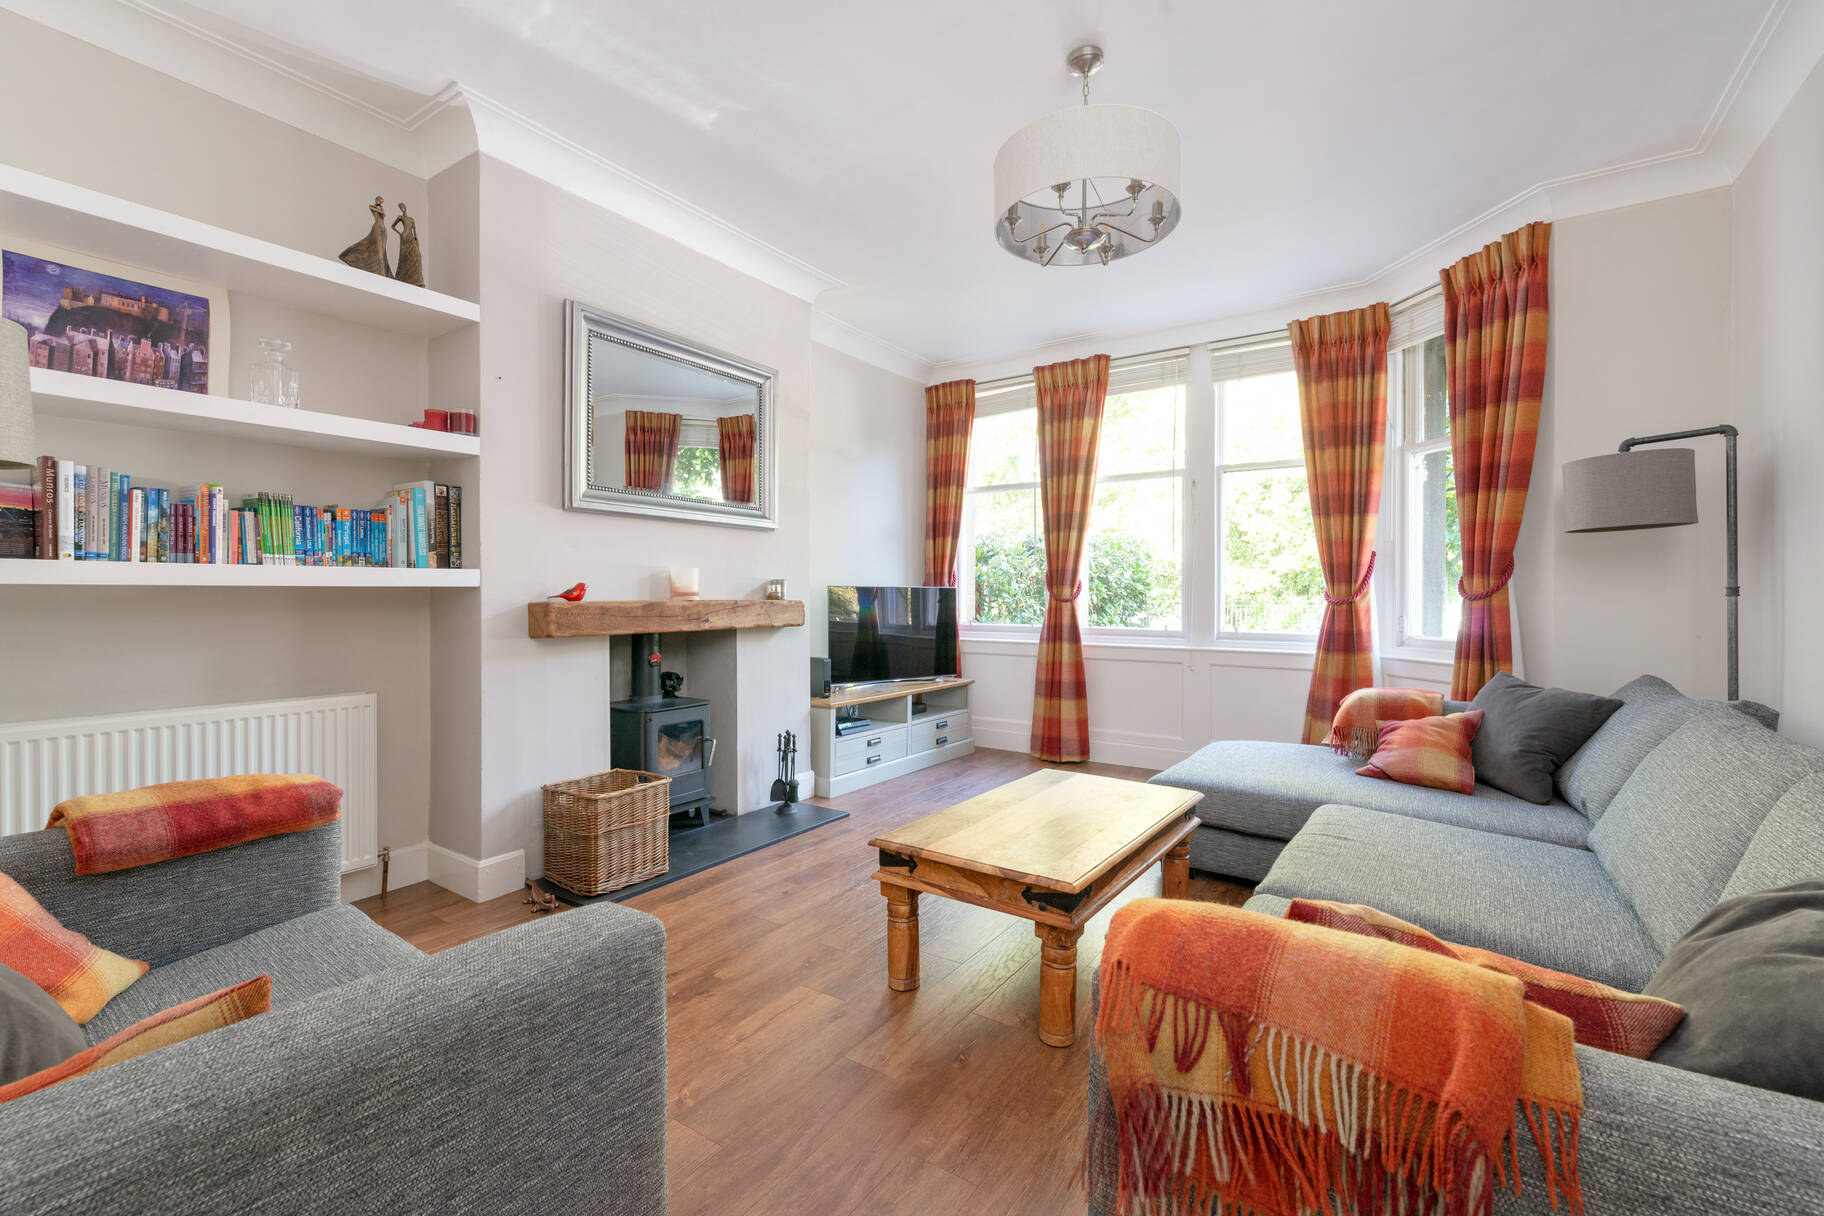 6 Greenbank Avenue, Morningside, Edinburgh, EH10 5RD